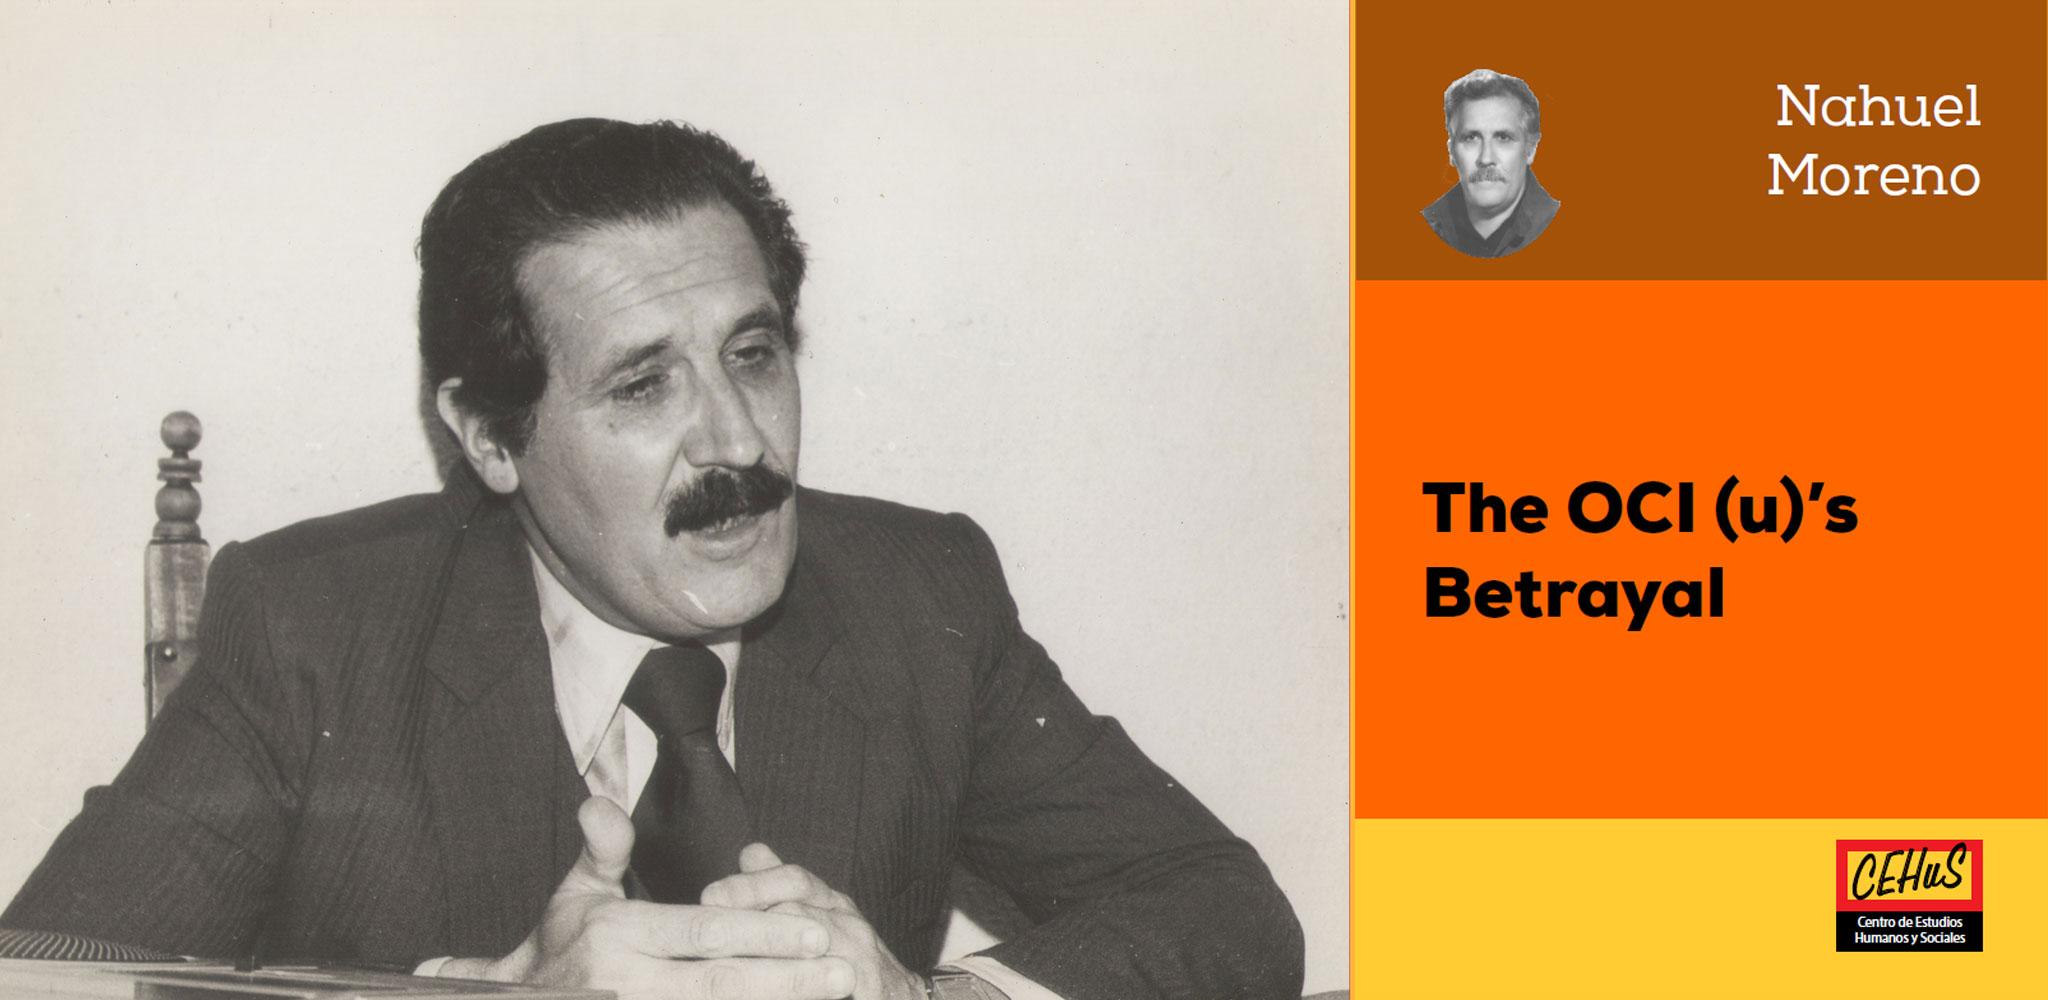 THE OCI-U'S BETRAYAL (1982)